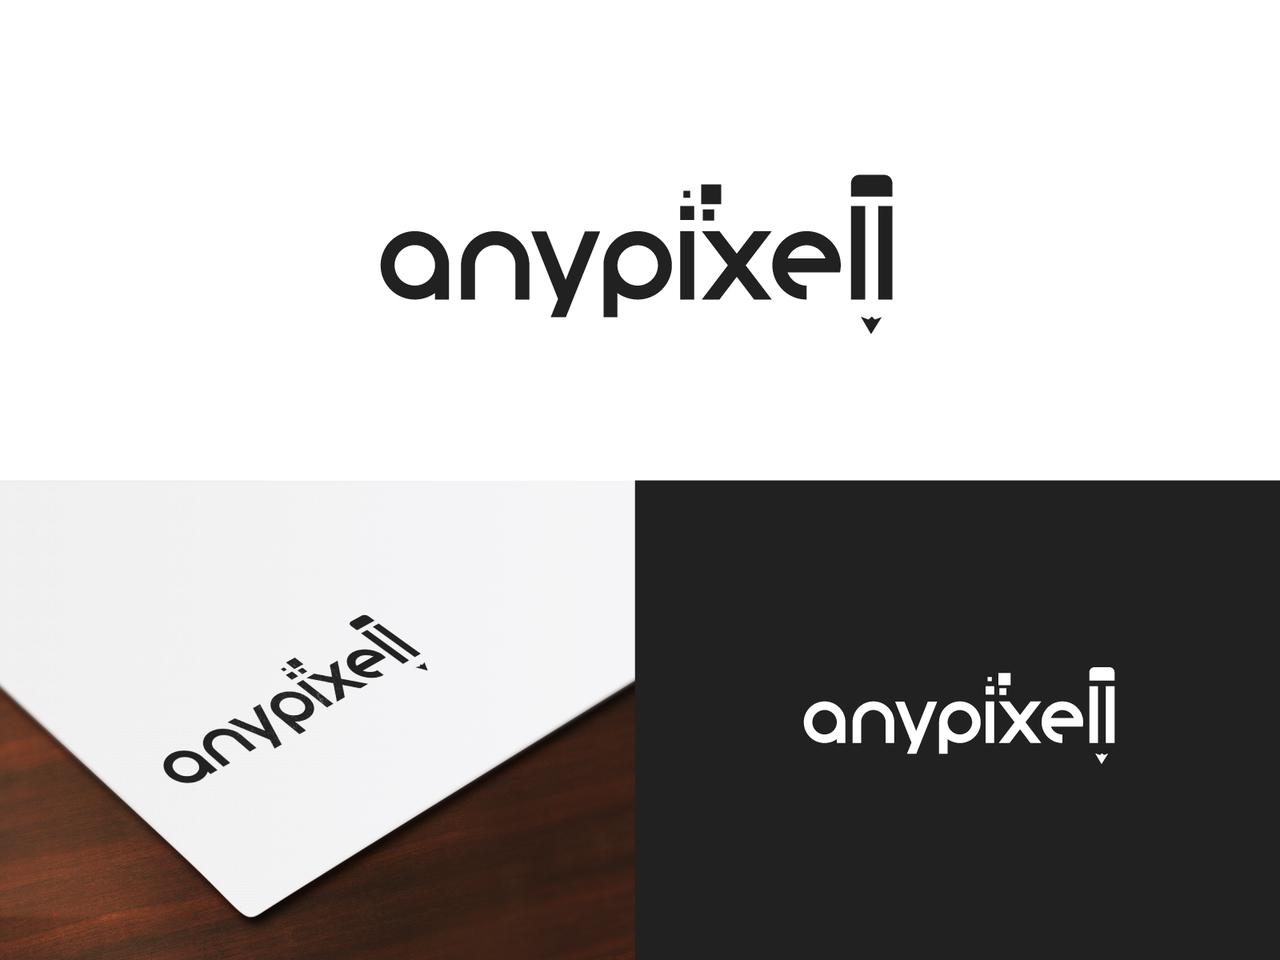 anypixell typography black logo pencil